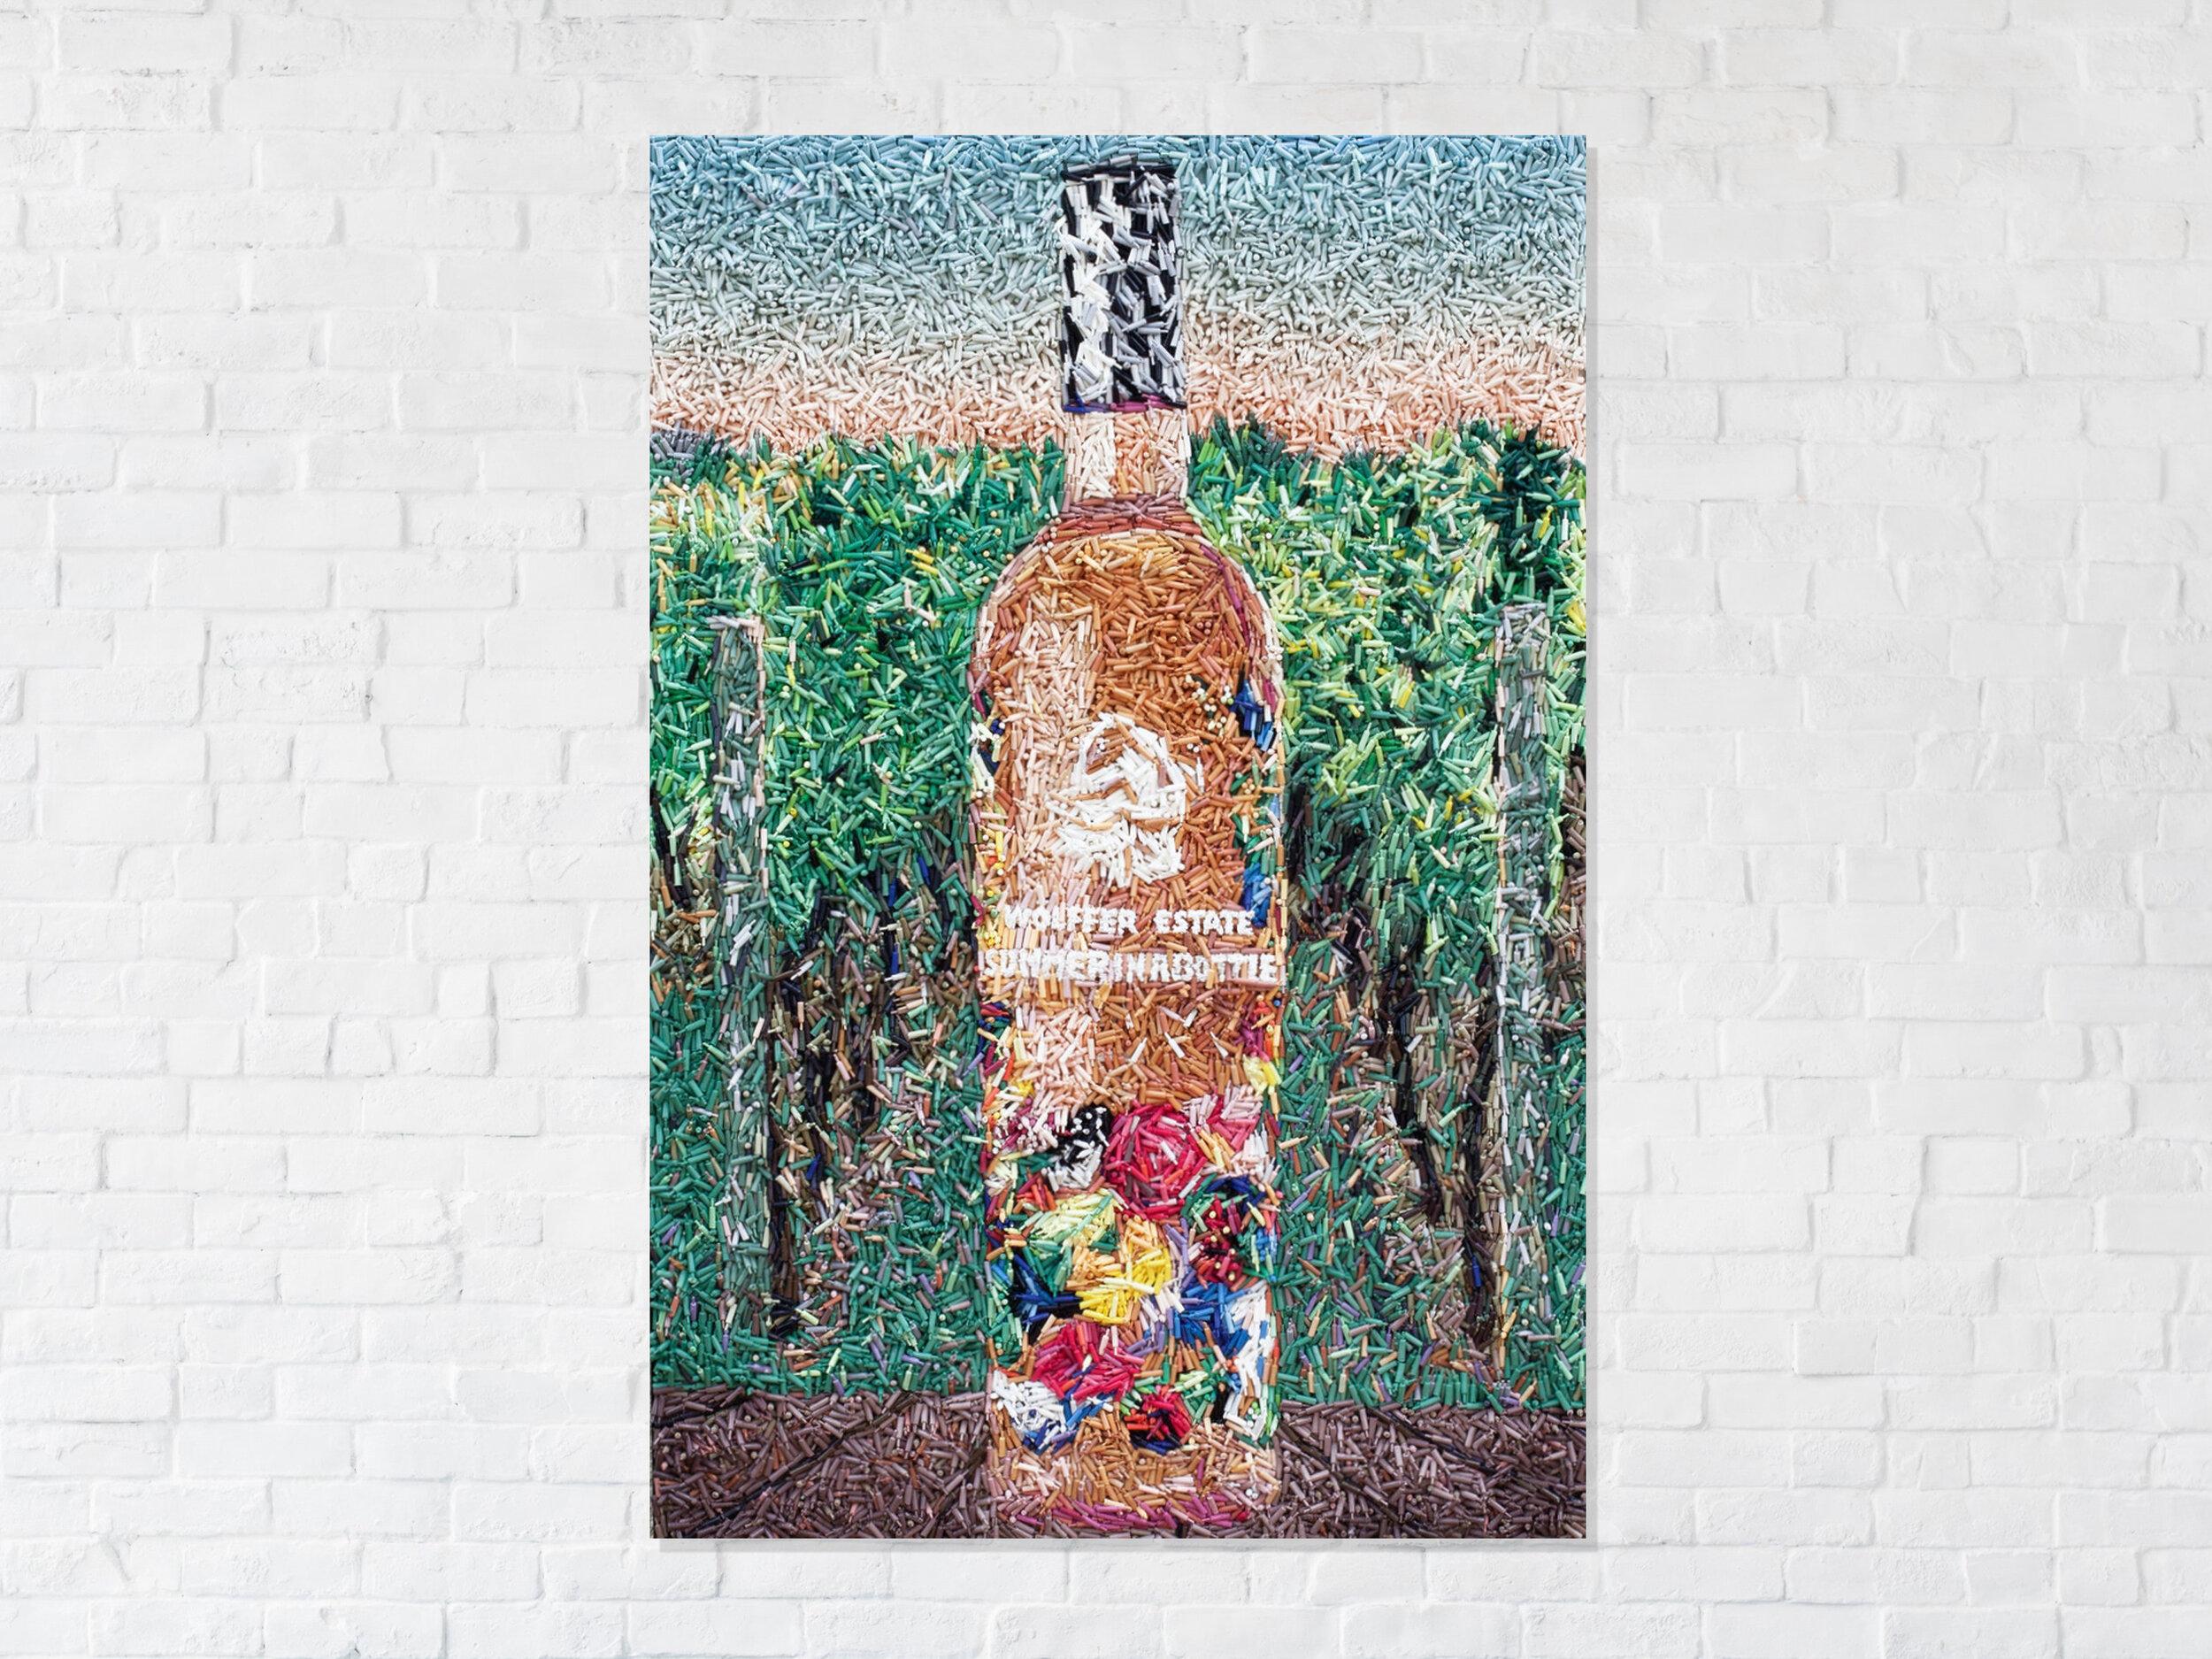 summer in a bottle - 27,000 hand cast wine bottles